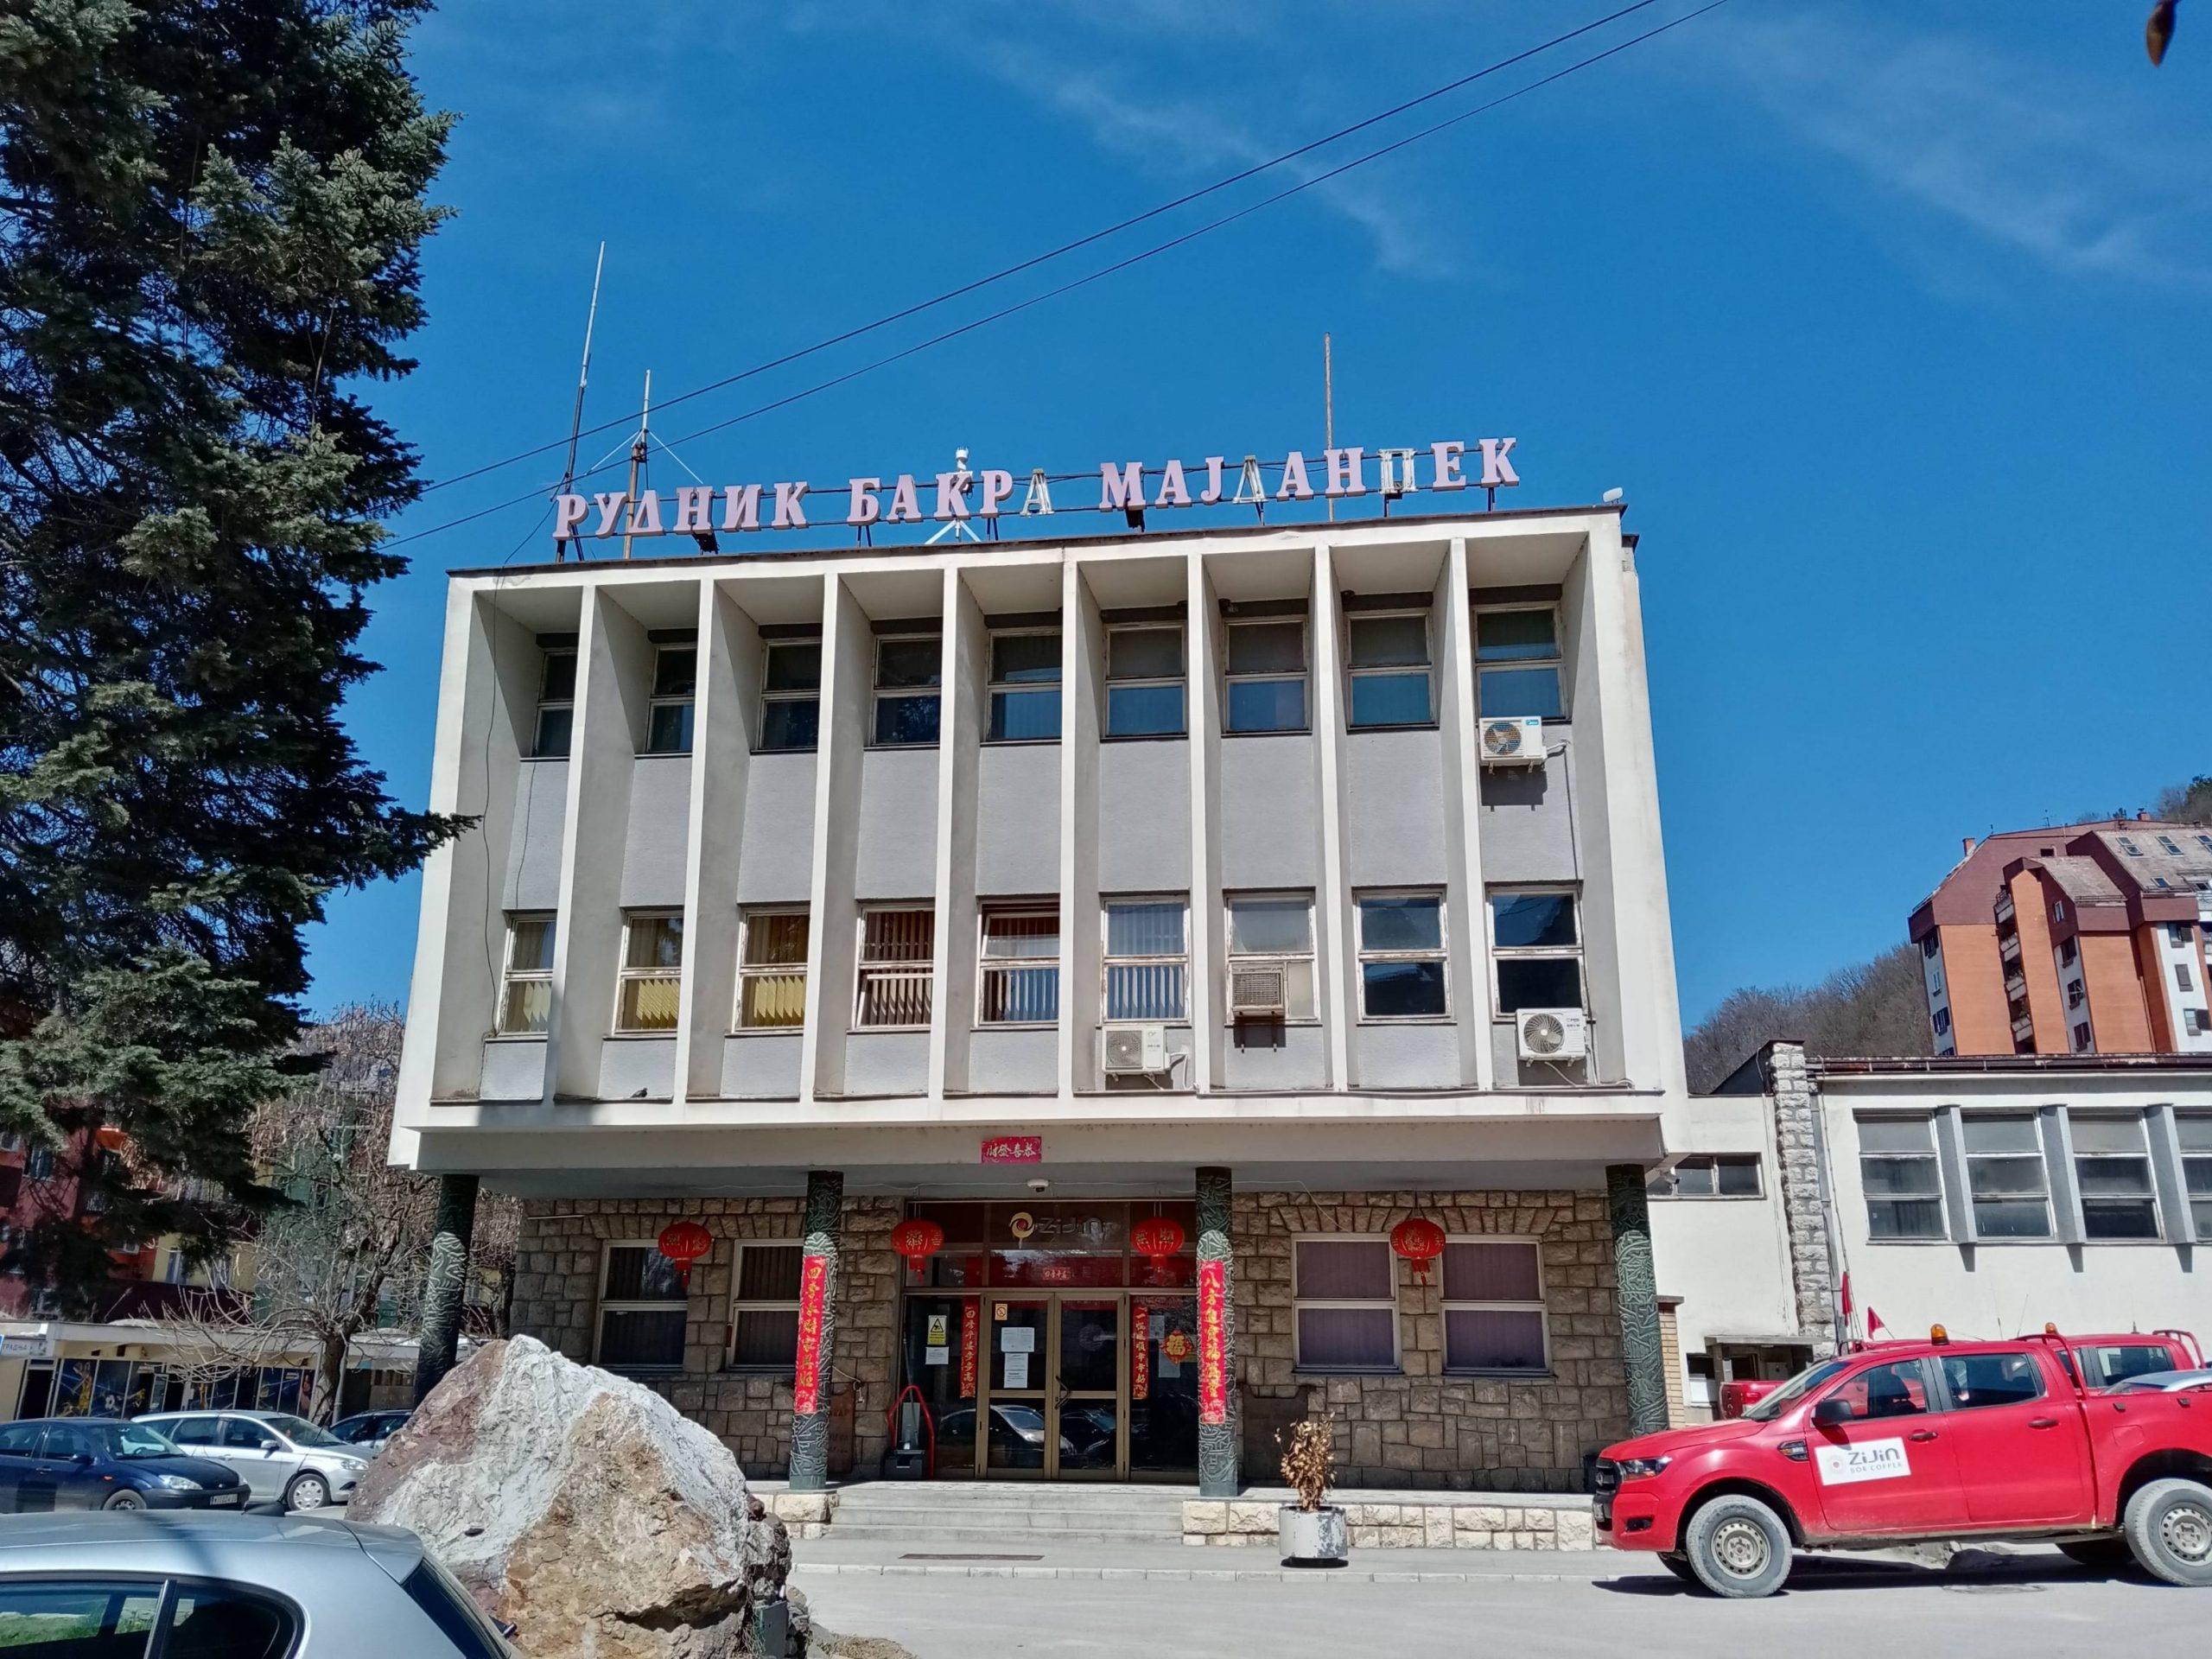 Ziđin koper Srbija: Eliminisaćemo i najmanji uticaj na kvalitet vode Peka 1